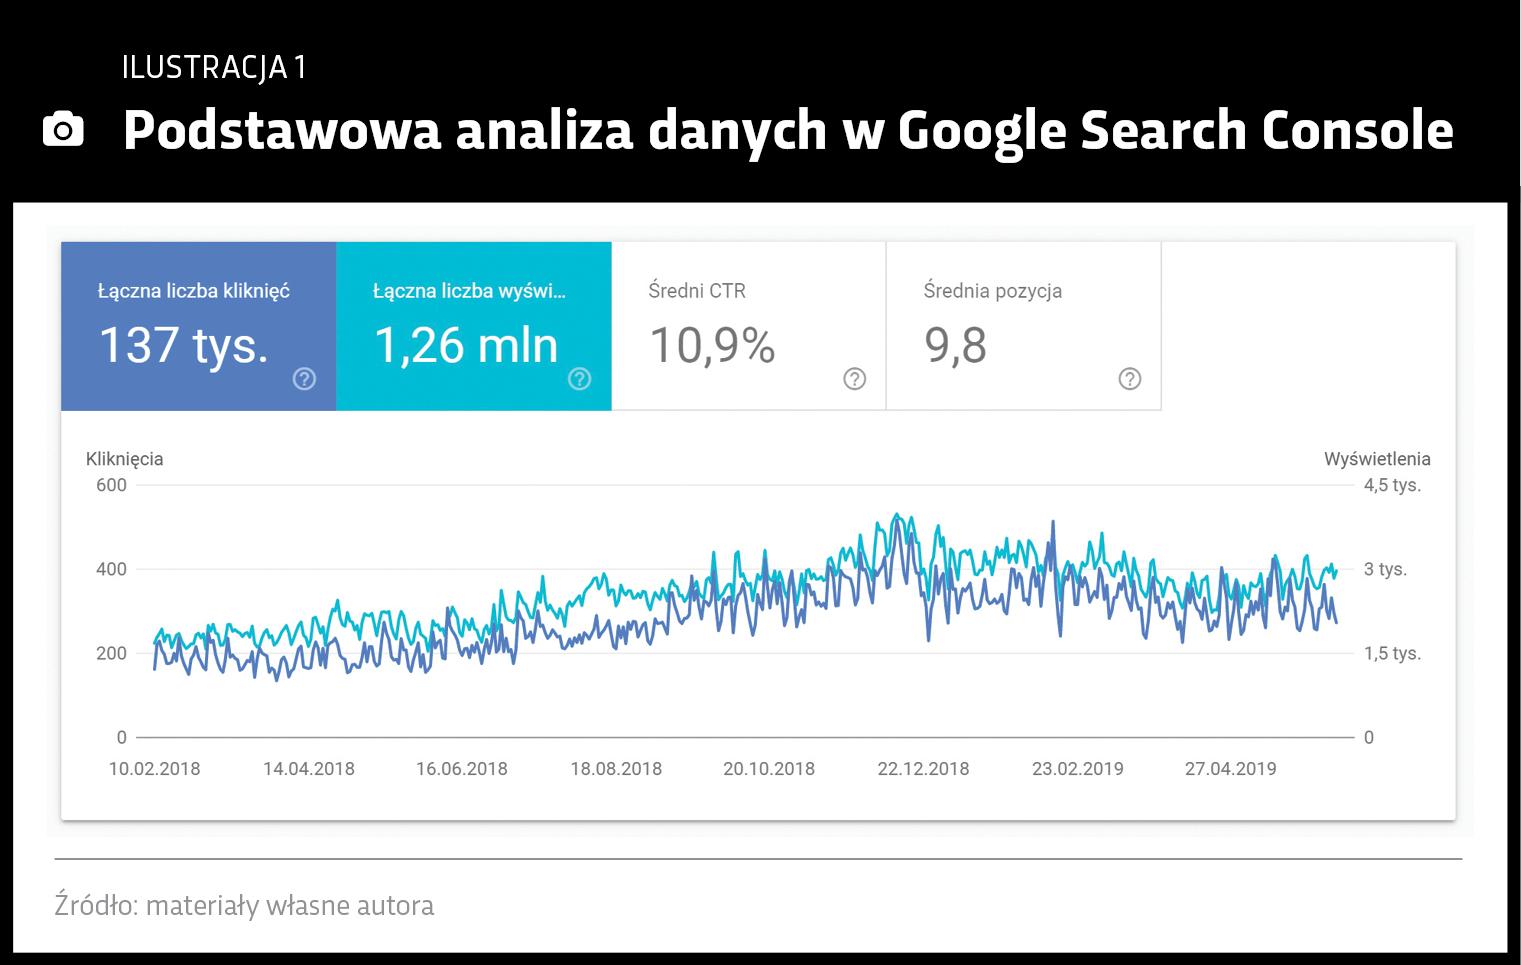 Analiza danych w Google Search Console